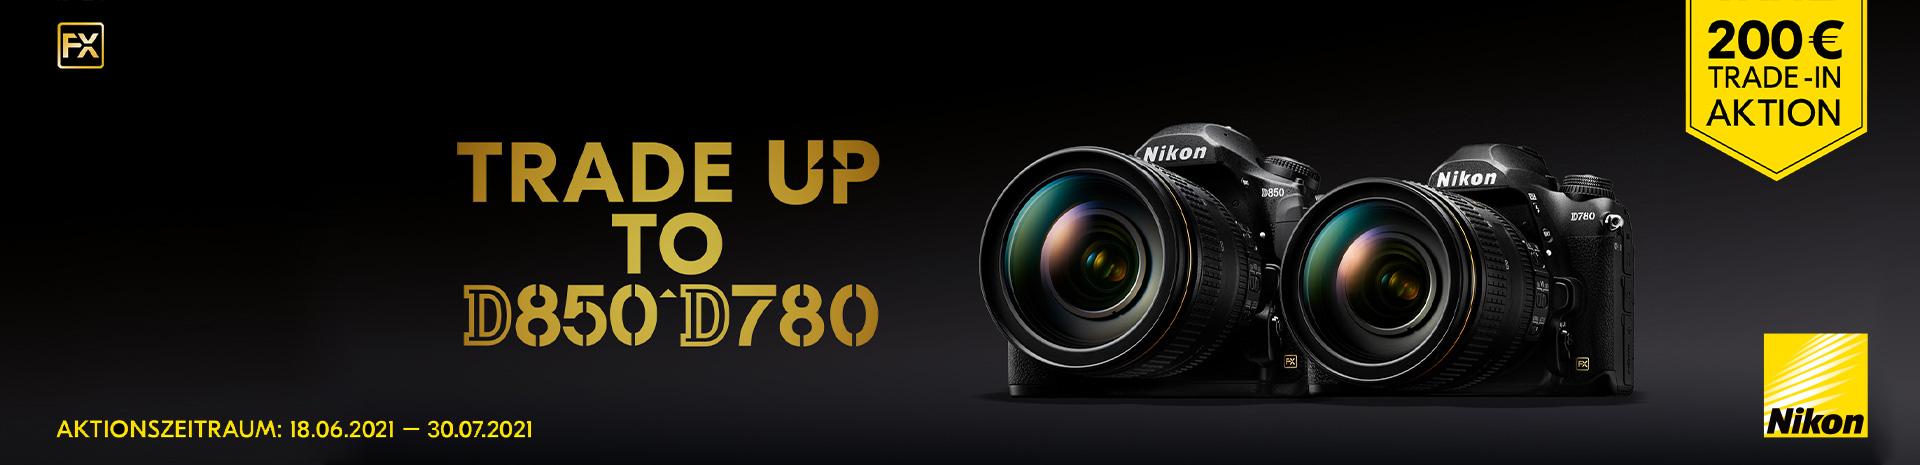 Nikon Trade-in Aktion